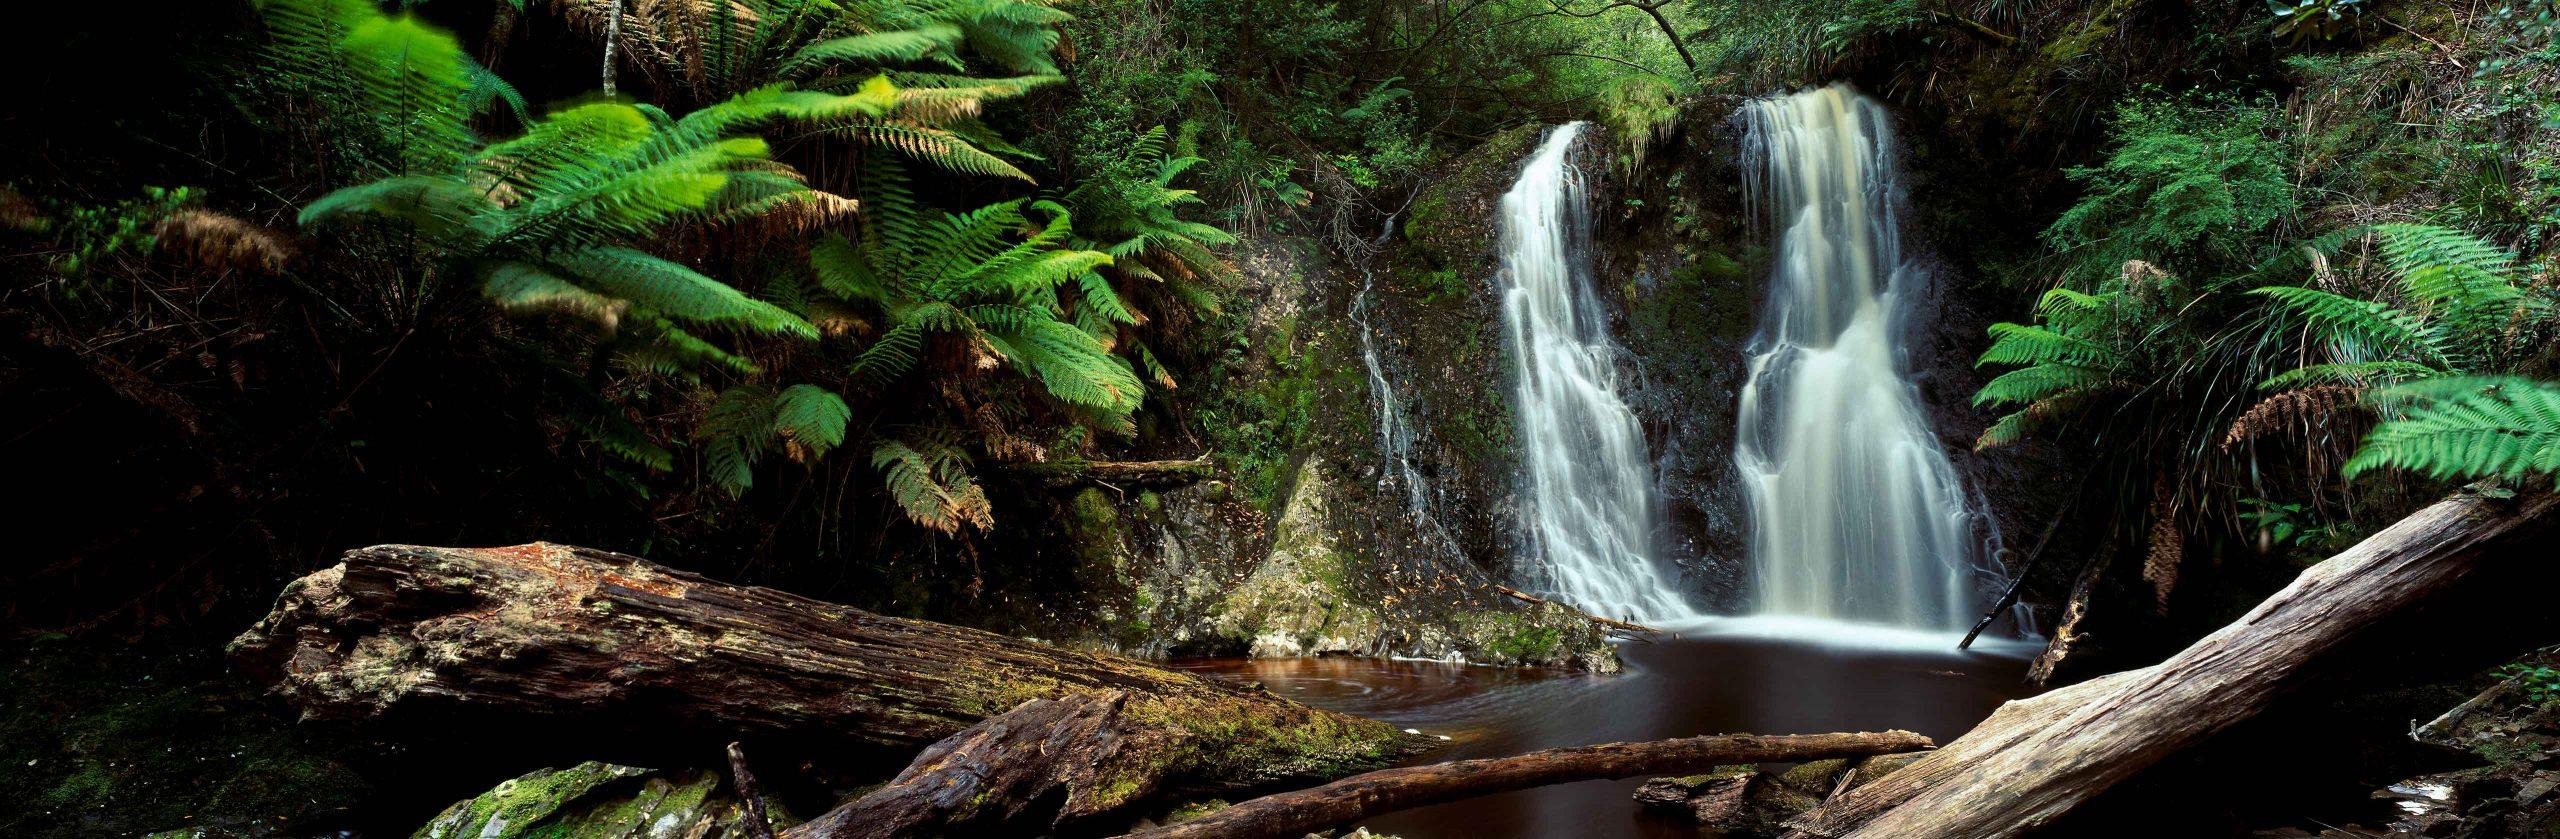 Hogarth Falls, Strahan, West Coast of Tasmania